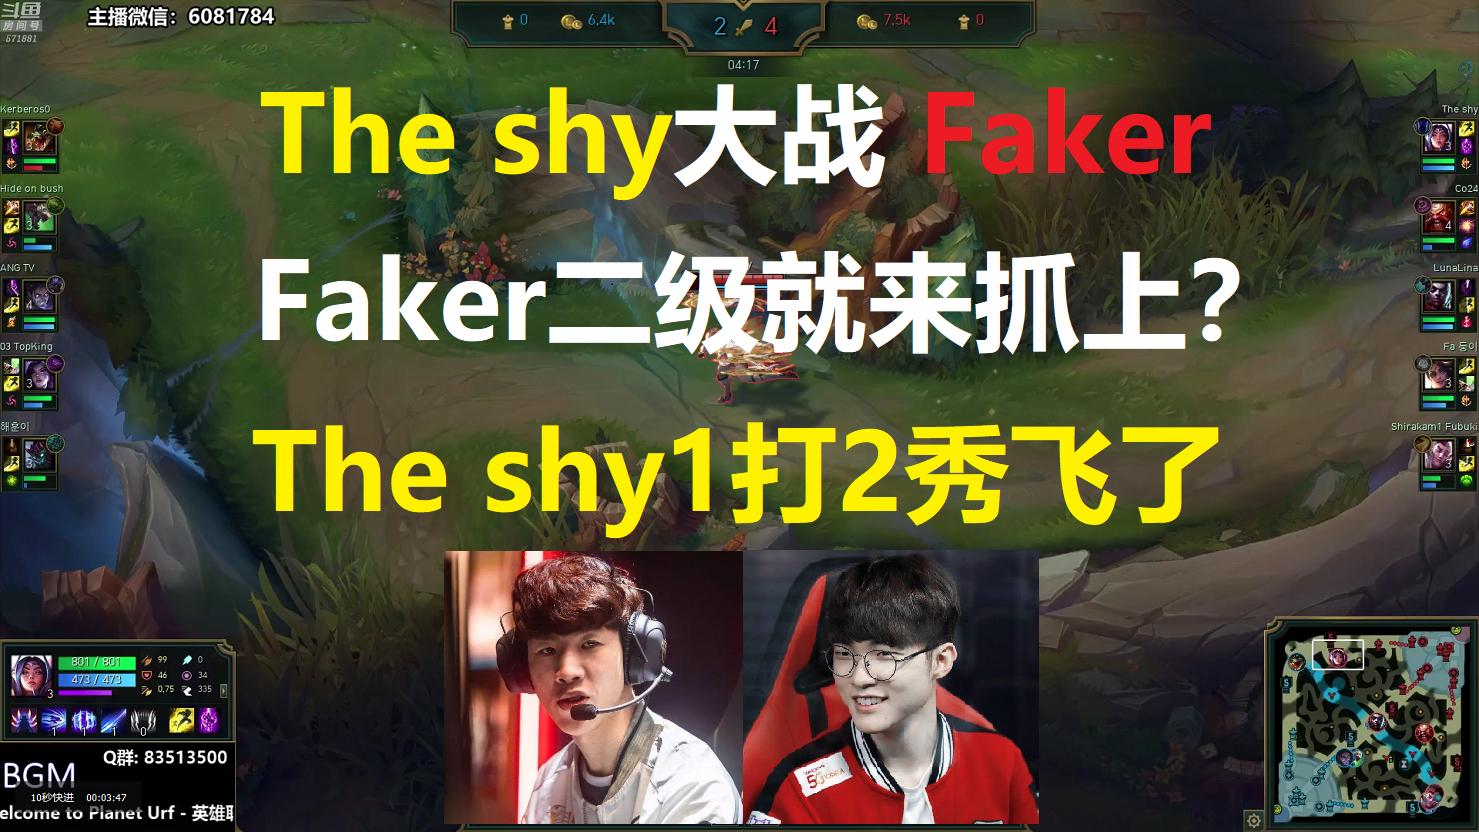 The shy大战Faker,飞科二级就来抓上?The shy1打2秀飞了!